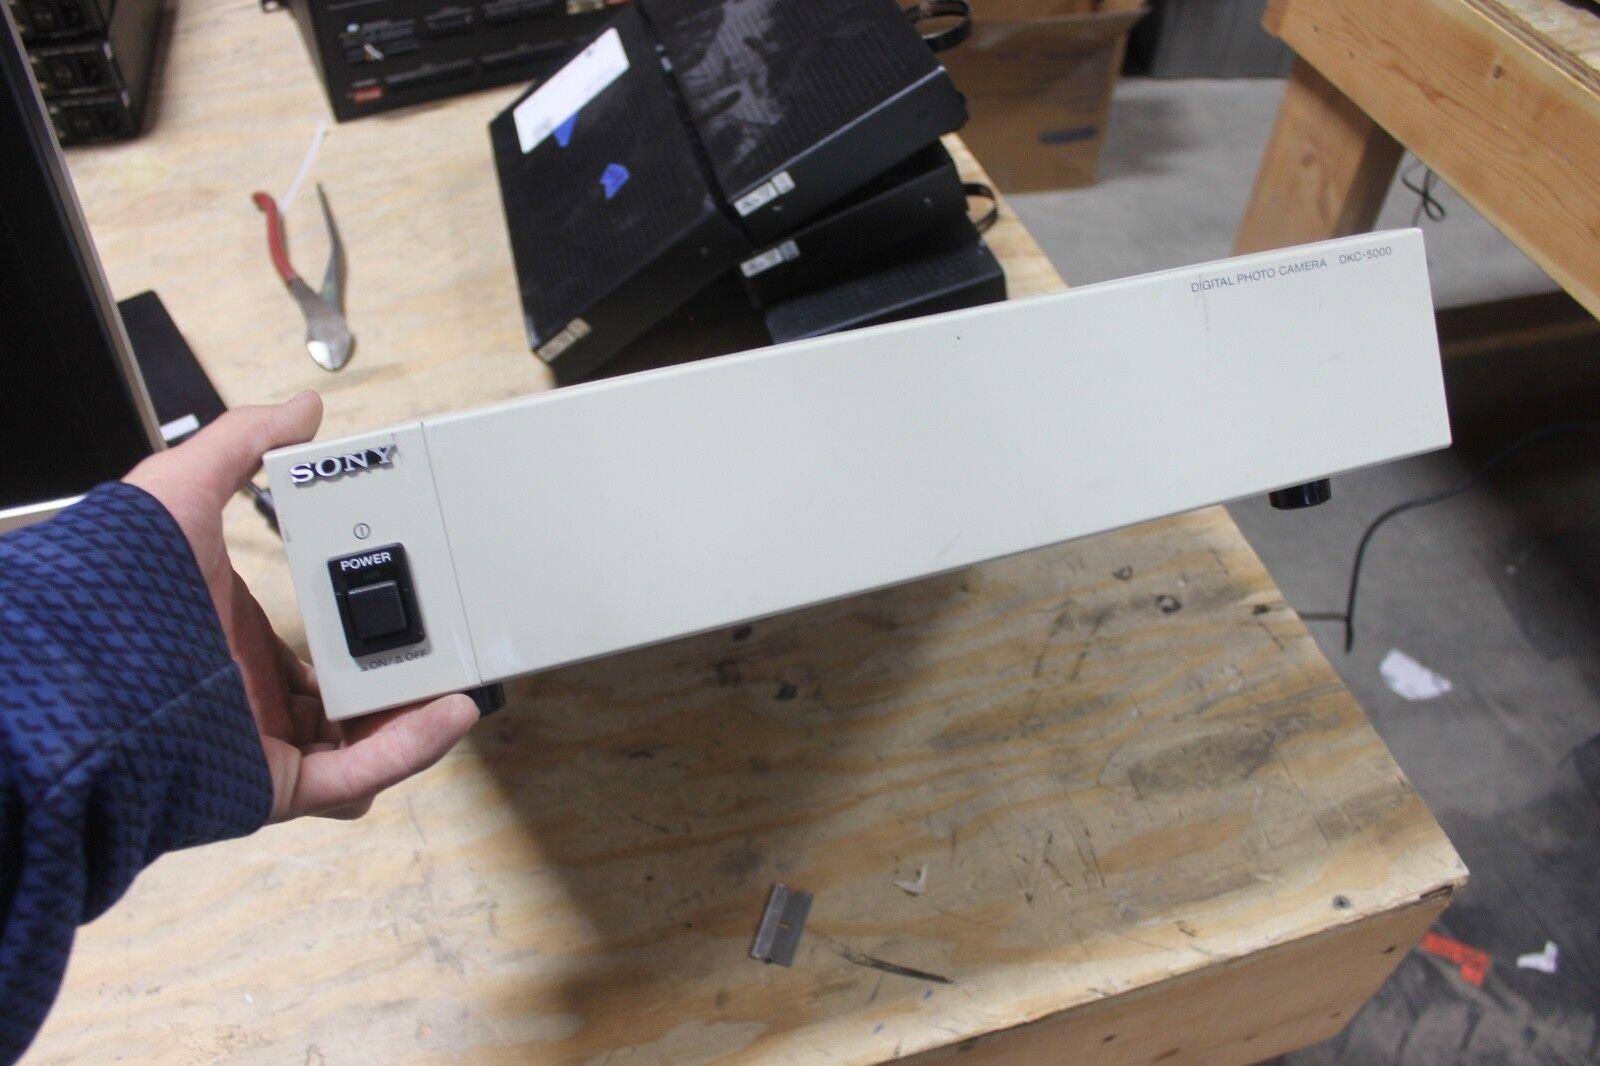 Sony DKC-5000 High-Resolution Digital Color Photo Camera Controller Unit